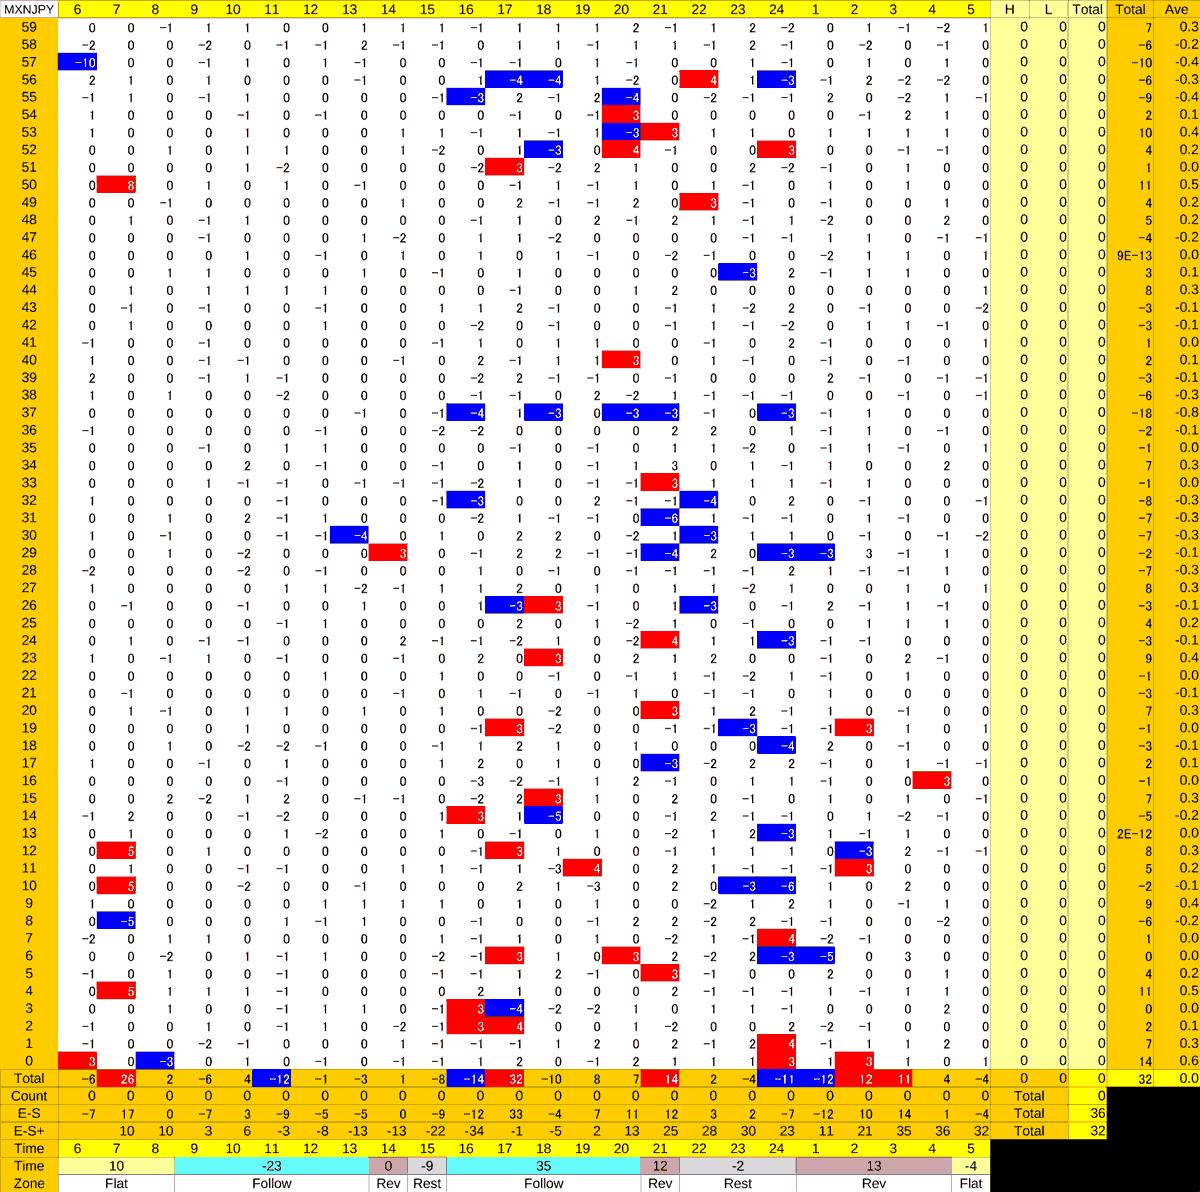 20210126_HS(3)MXNJPY